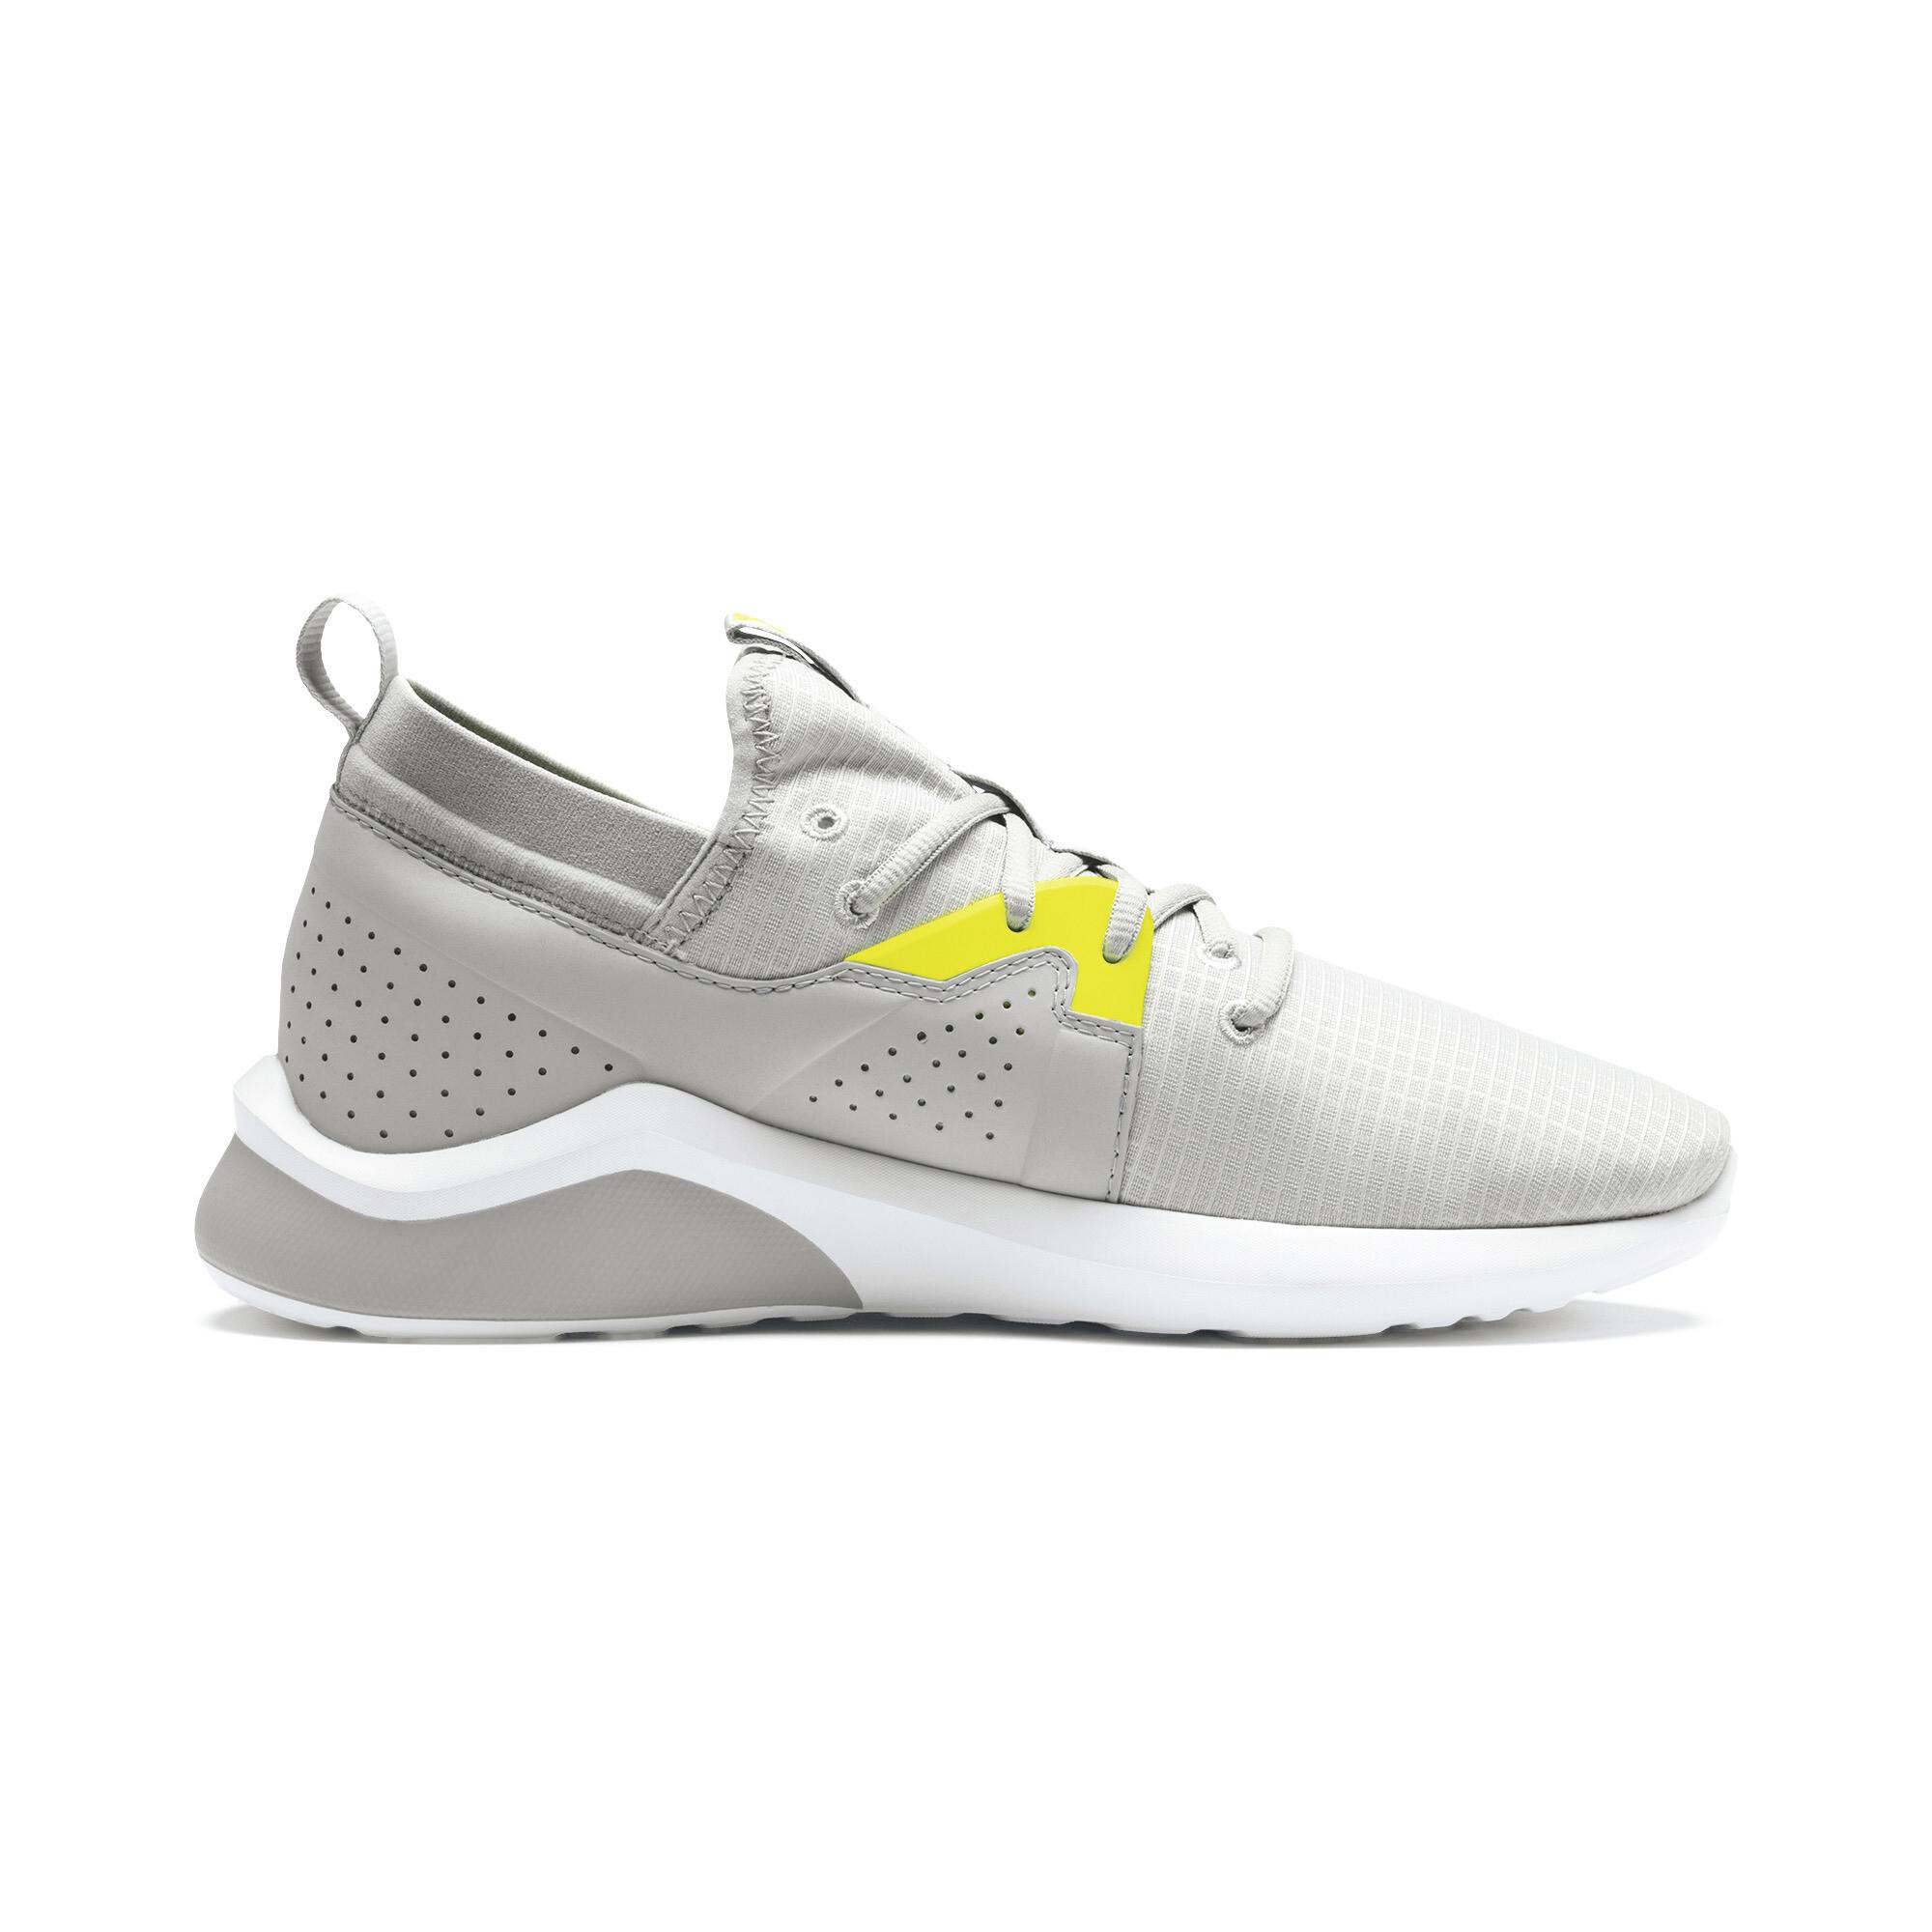 PUMA-Emergence-Lights-Men-039-s-Training-Shoes-Men-Shoe-Running thumbnail 7